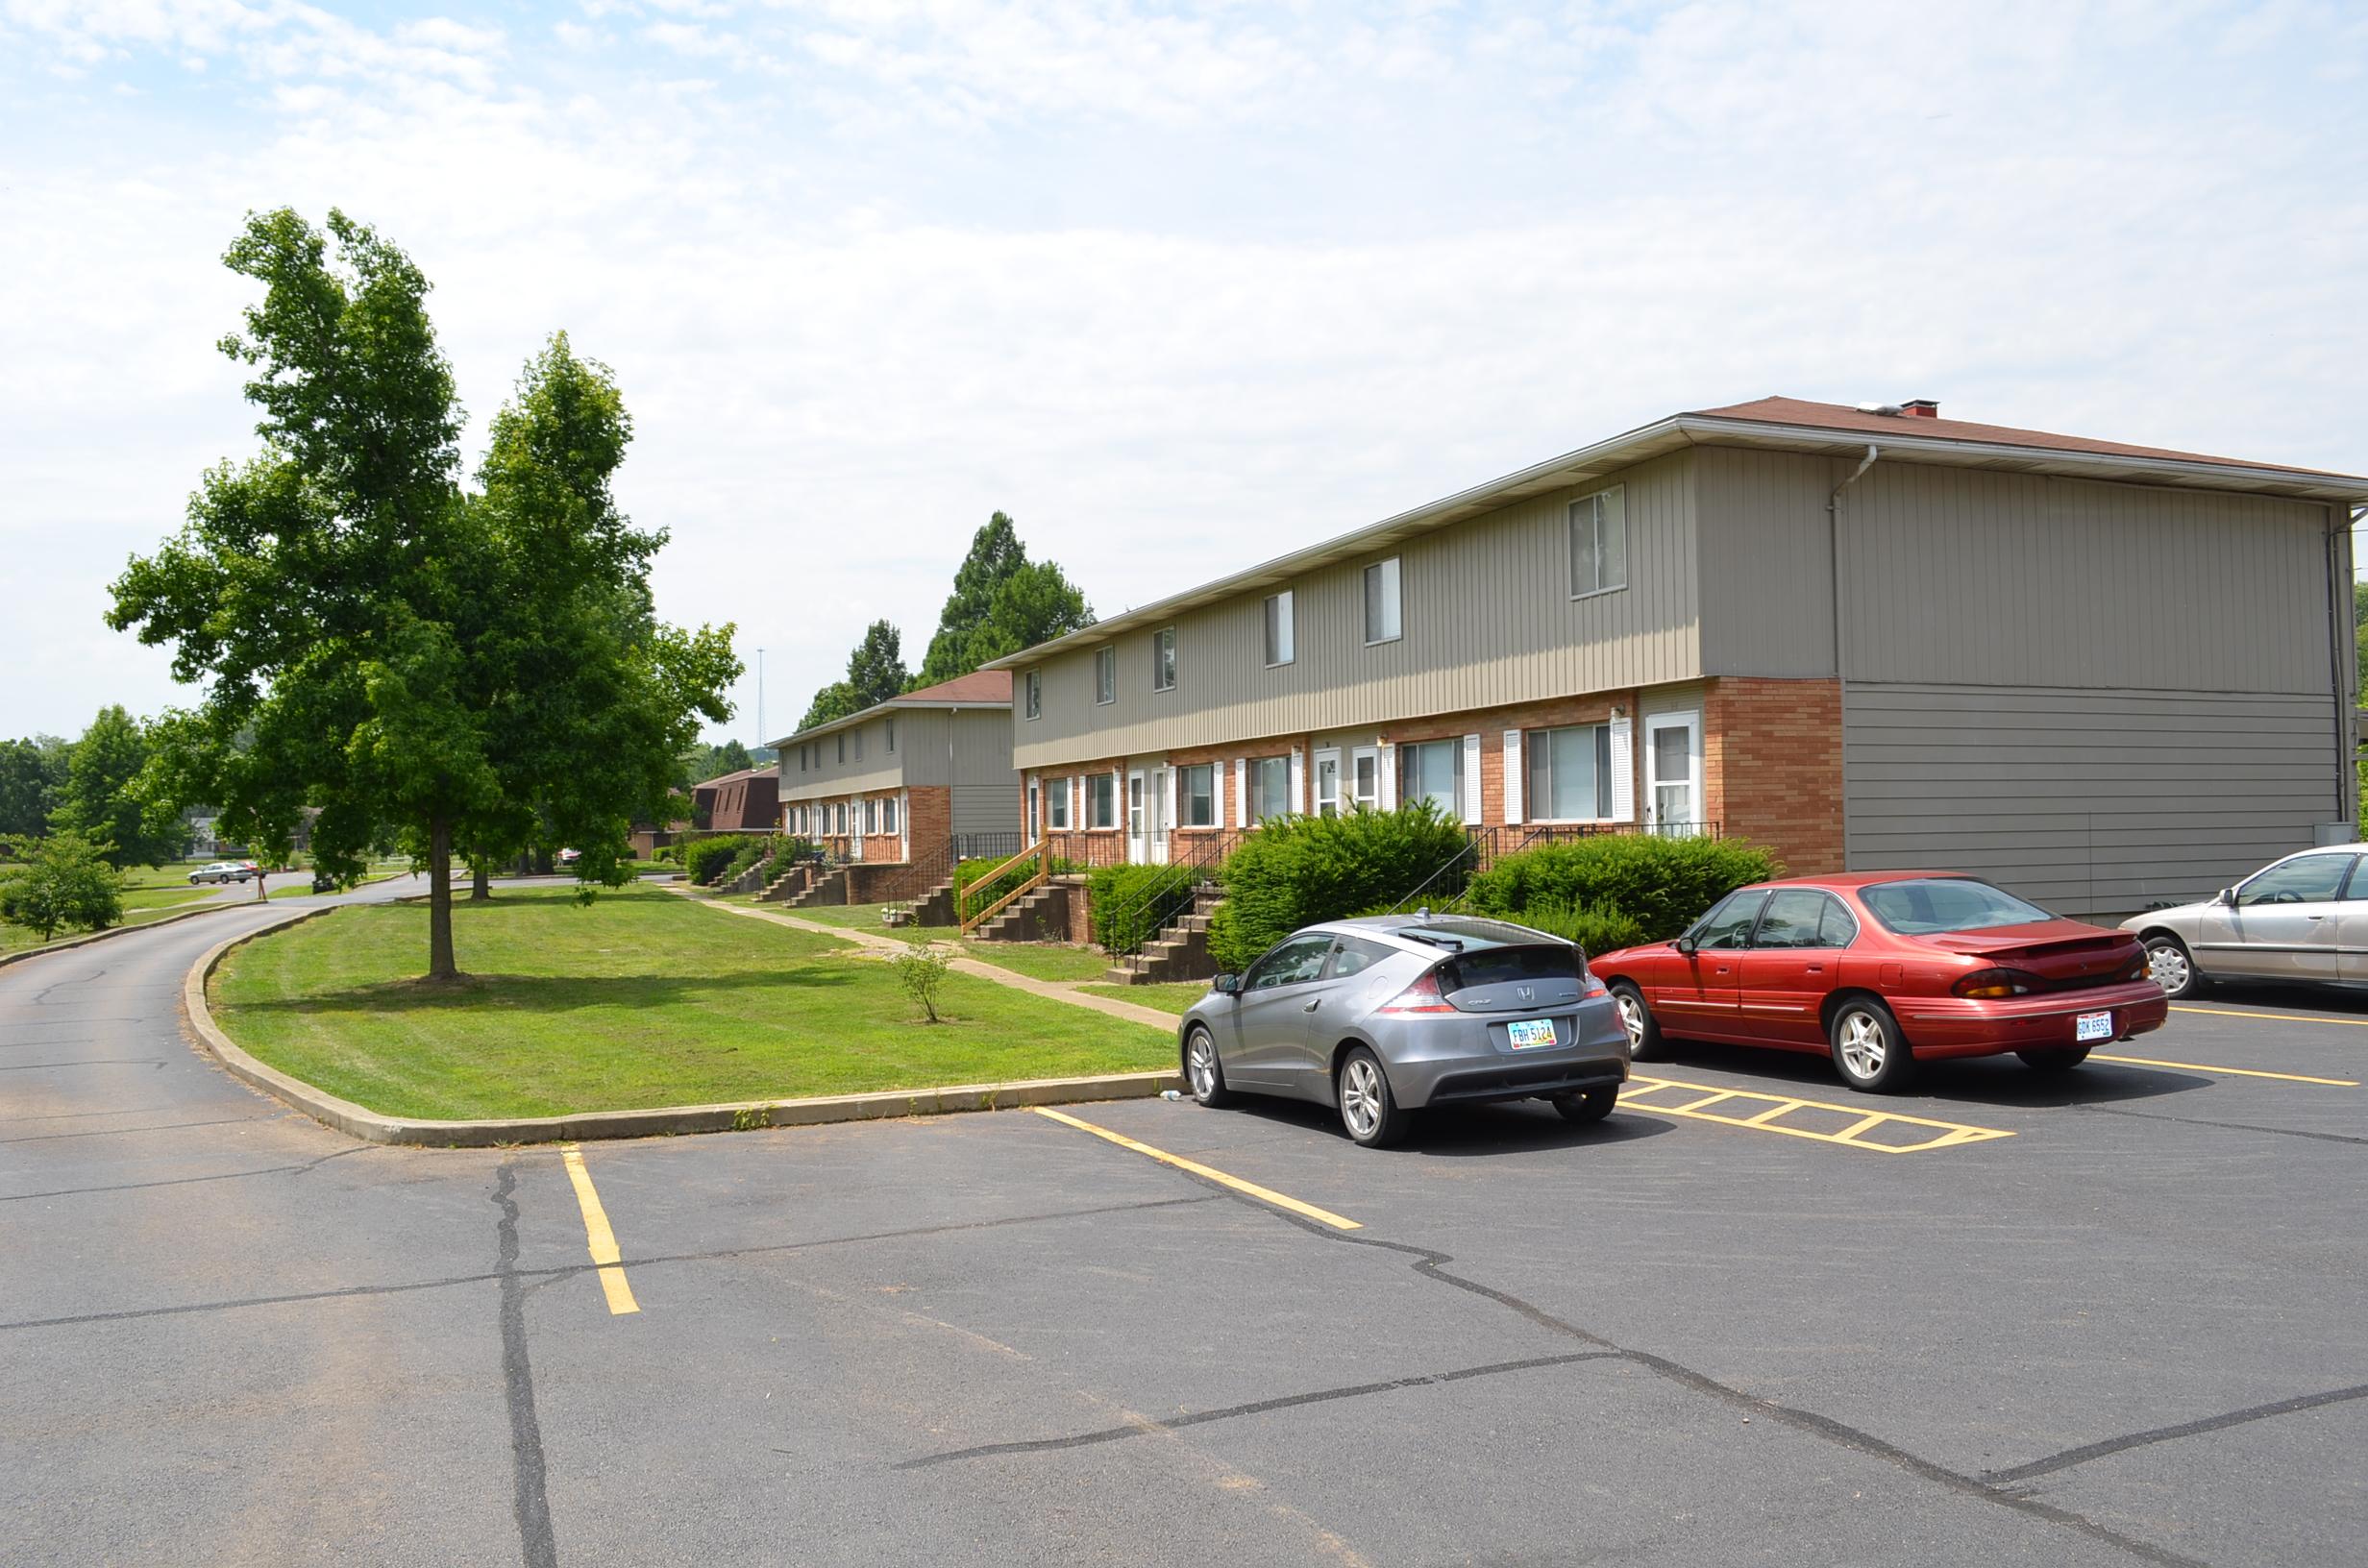 athens ohio rental housing Capstone Village. CAPSTONE Properties   Athens Ohio   Apartments   Homes   Rentals